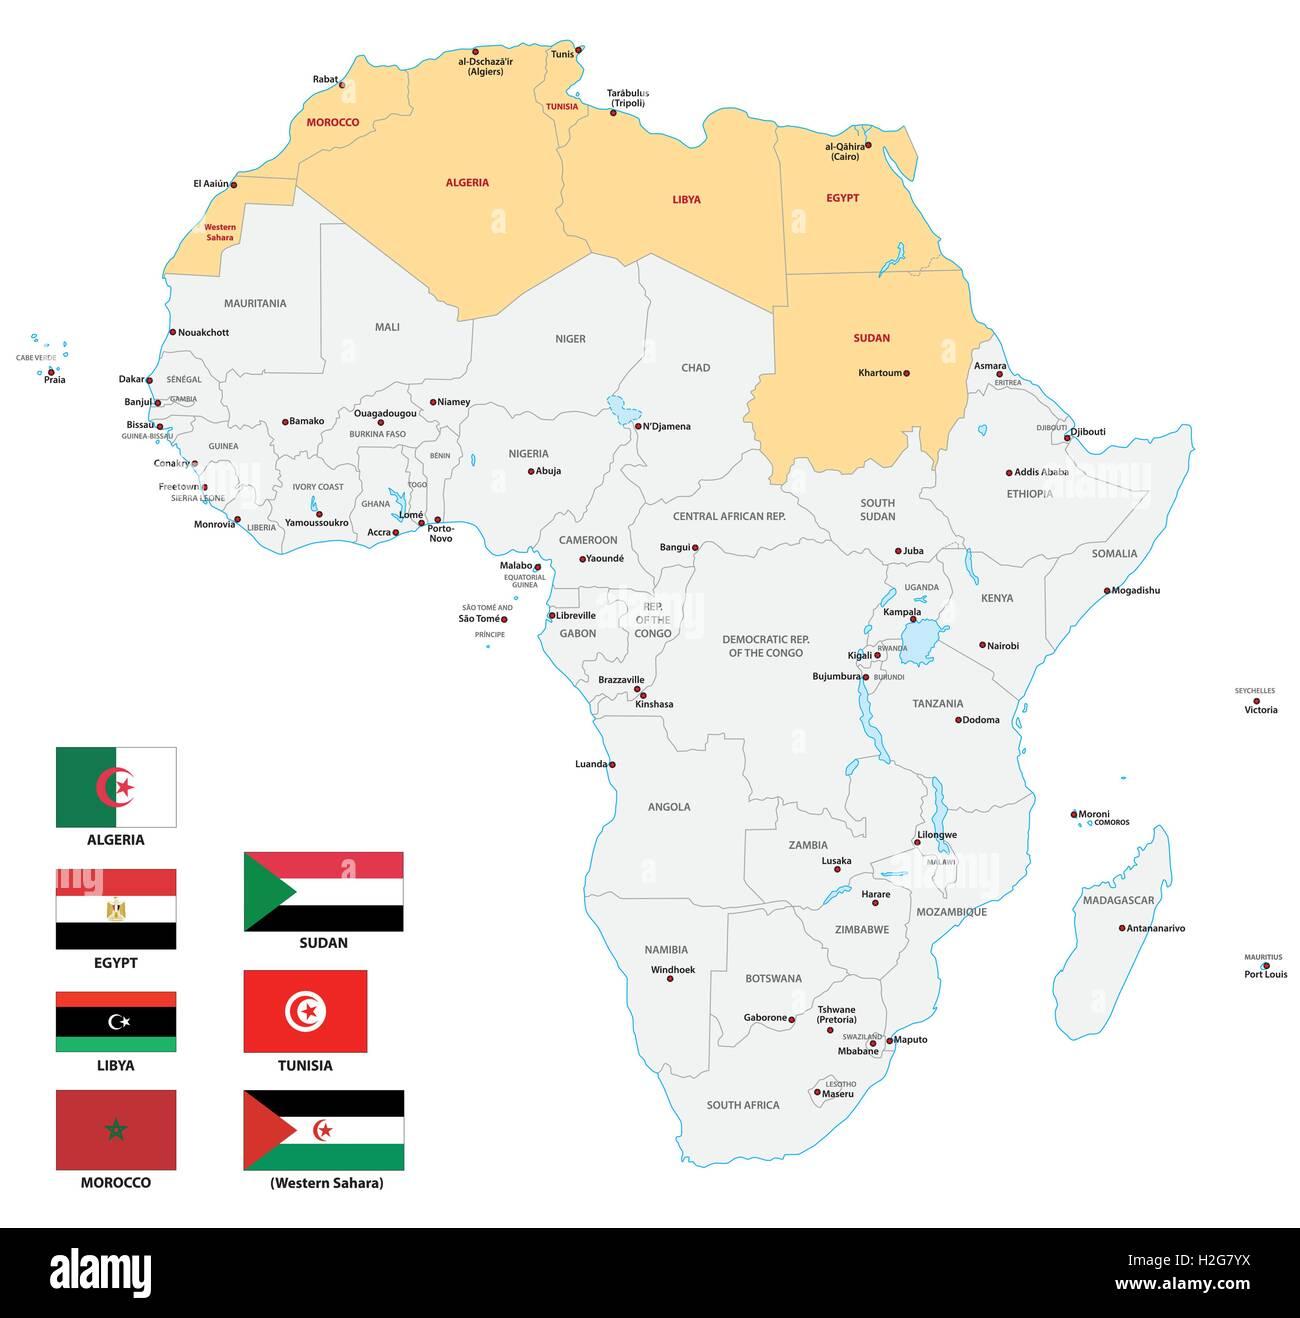 Cartina Africa Del Nord.Mappa Africa Immagini Mappa Africa Fotos Stock Alamy